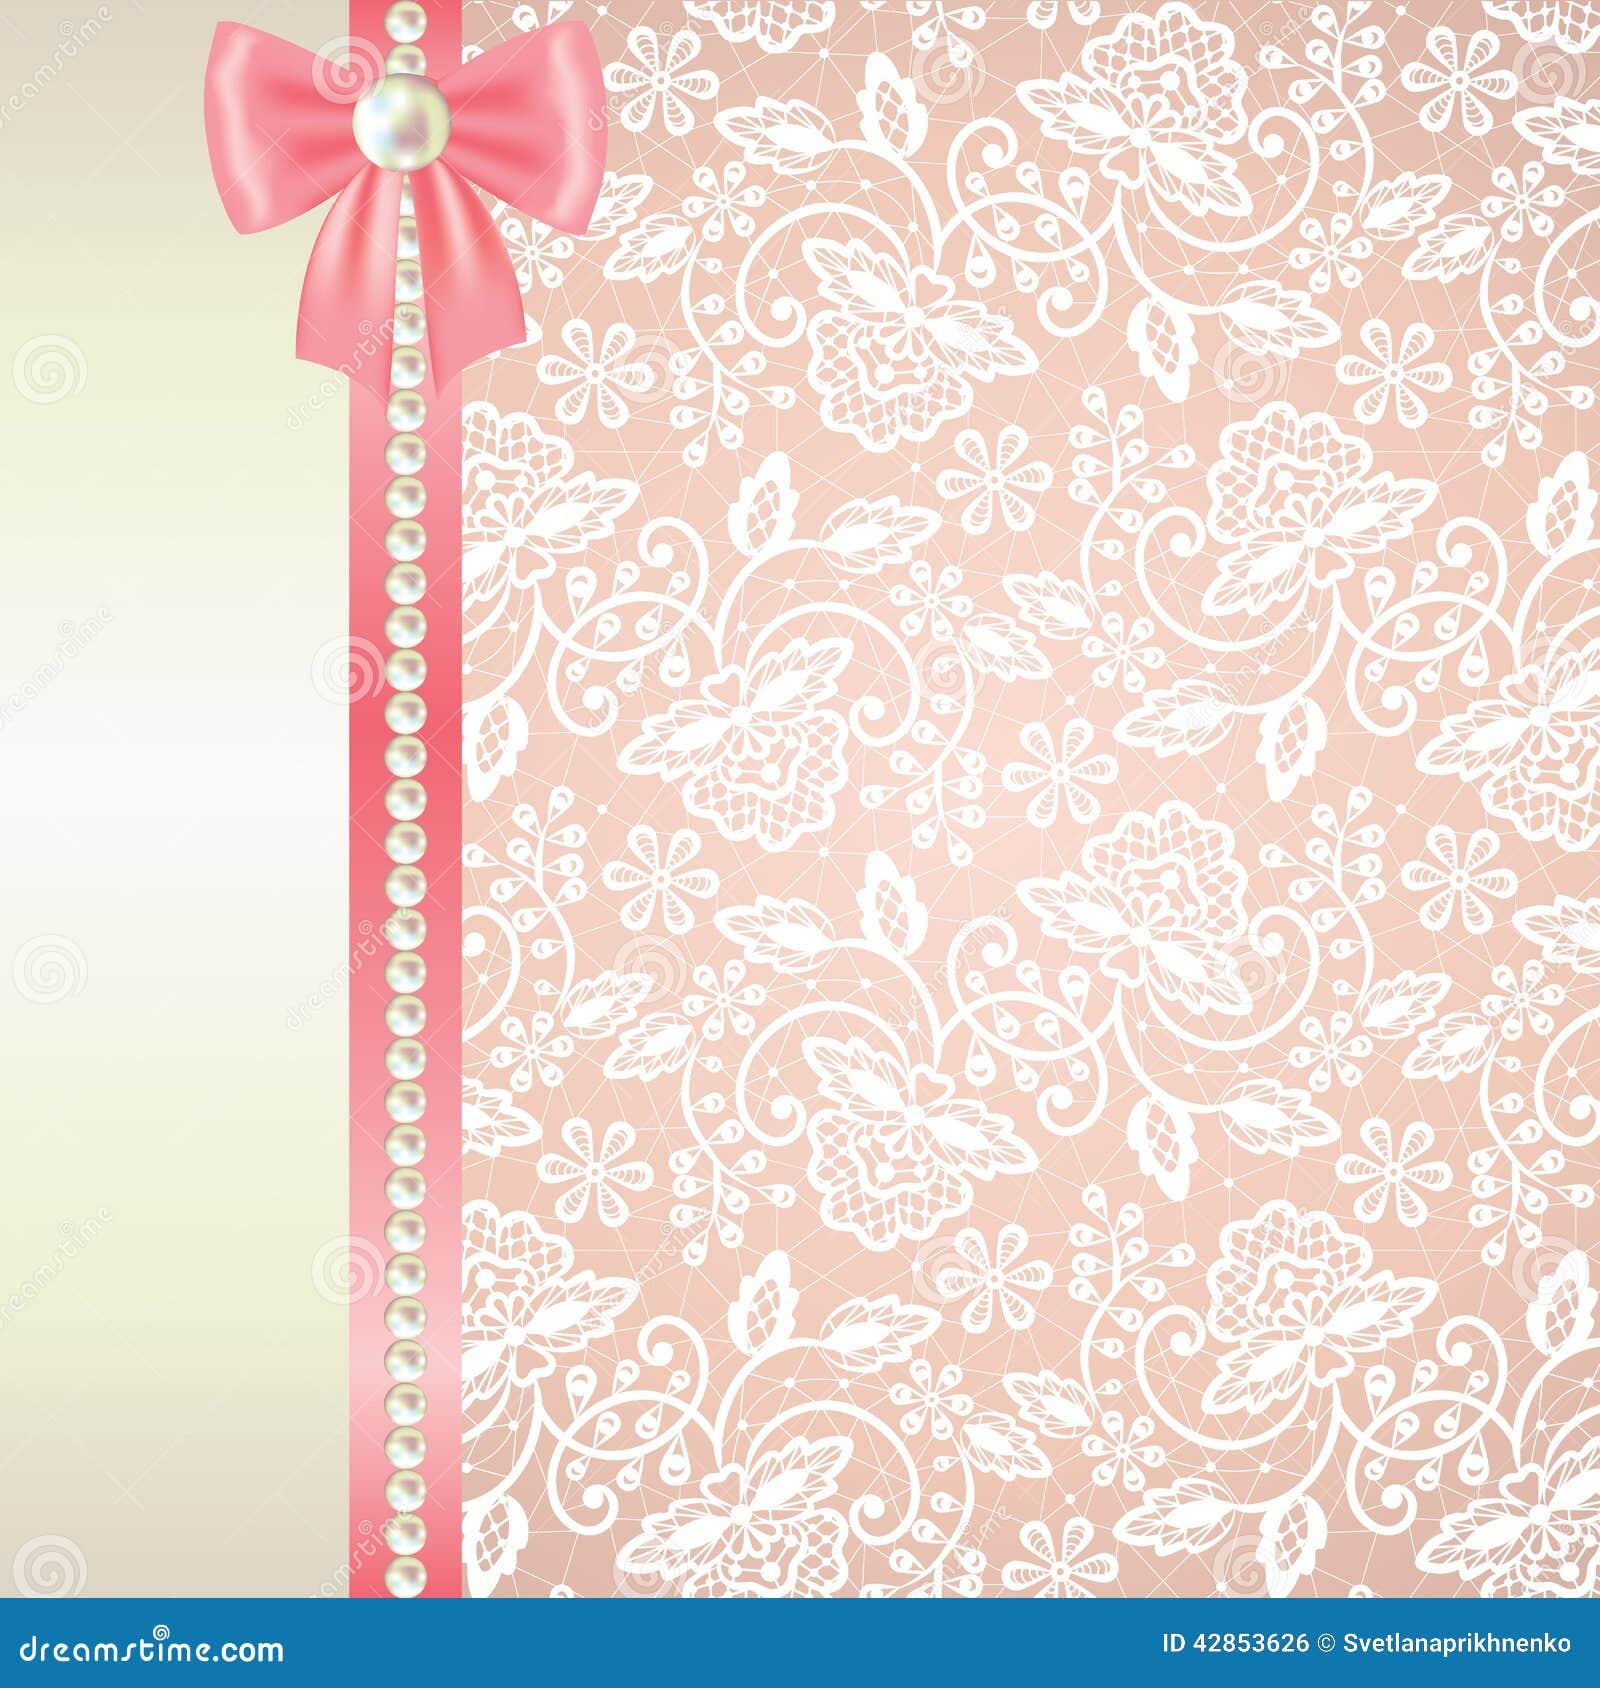 Pink Bridal Shower Invitations is good invitation design